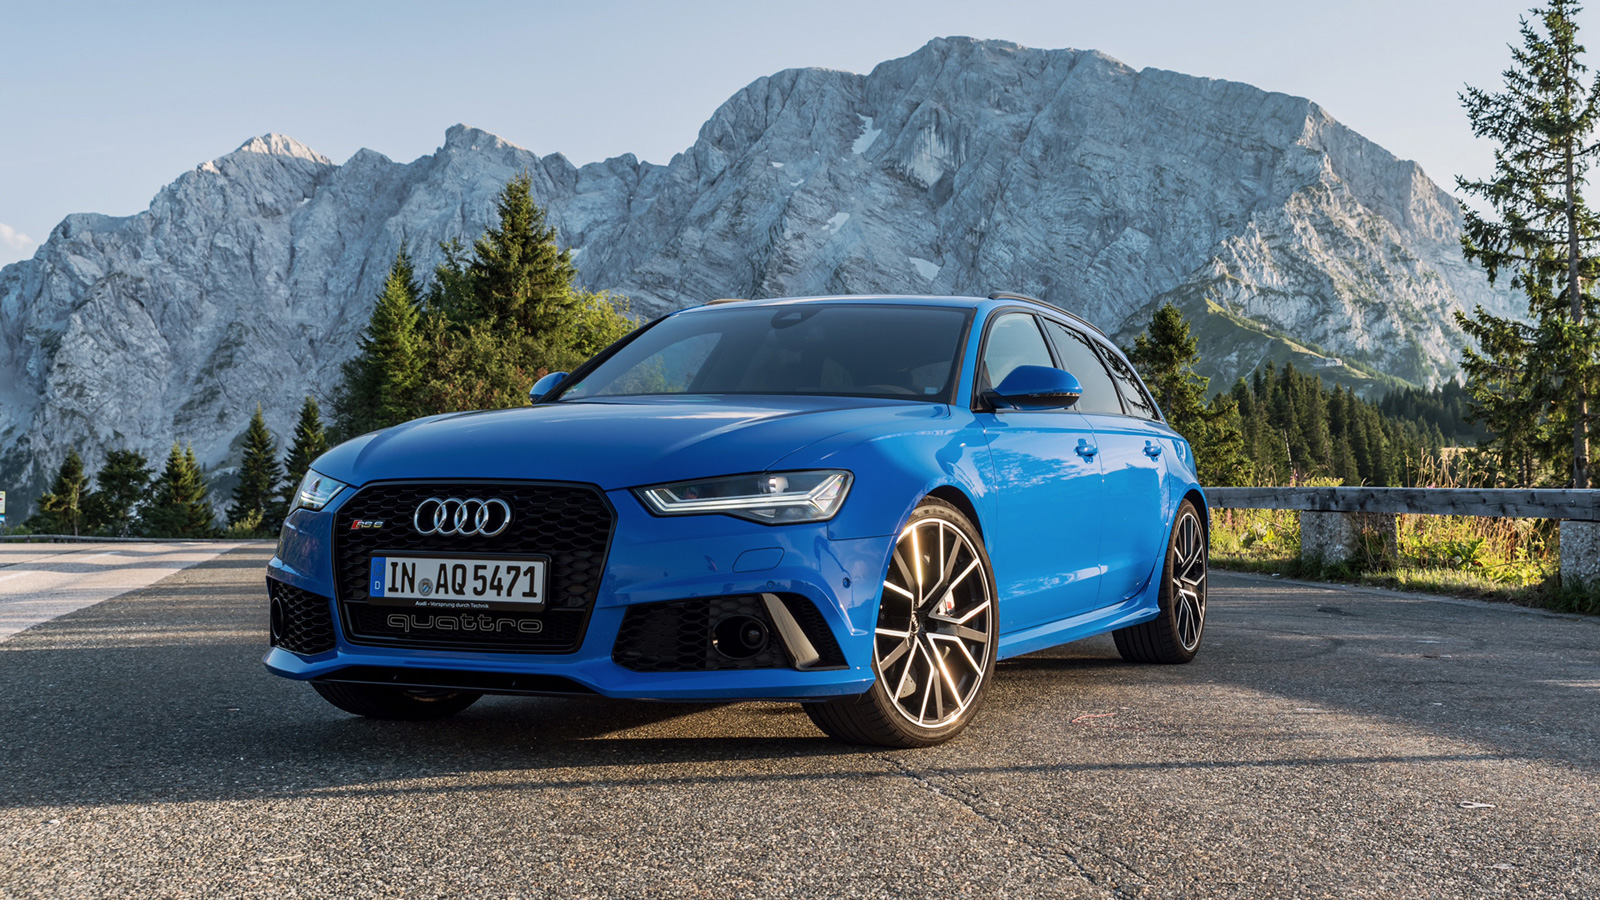 Audi-A1-pq25-OSIR-Design-991